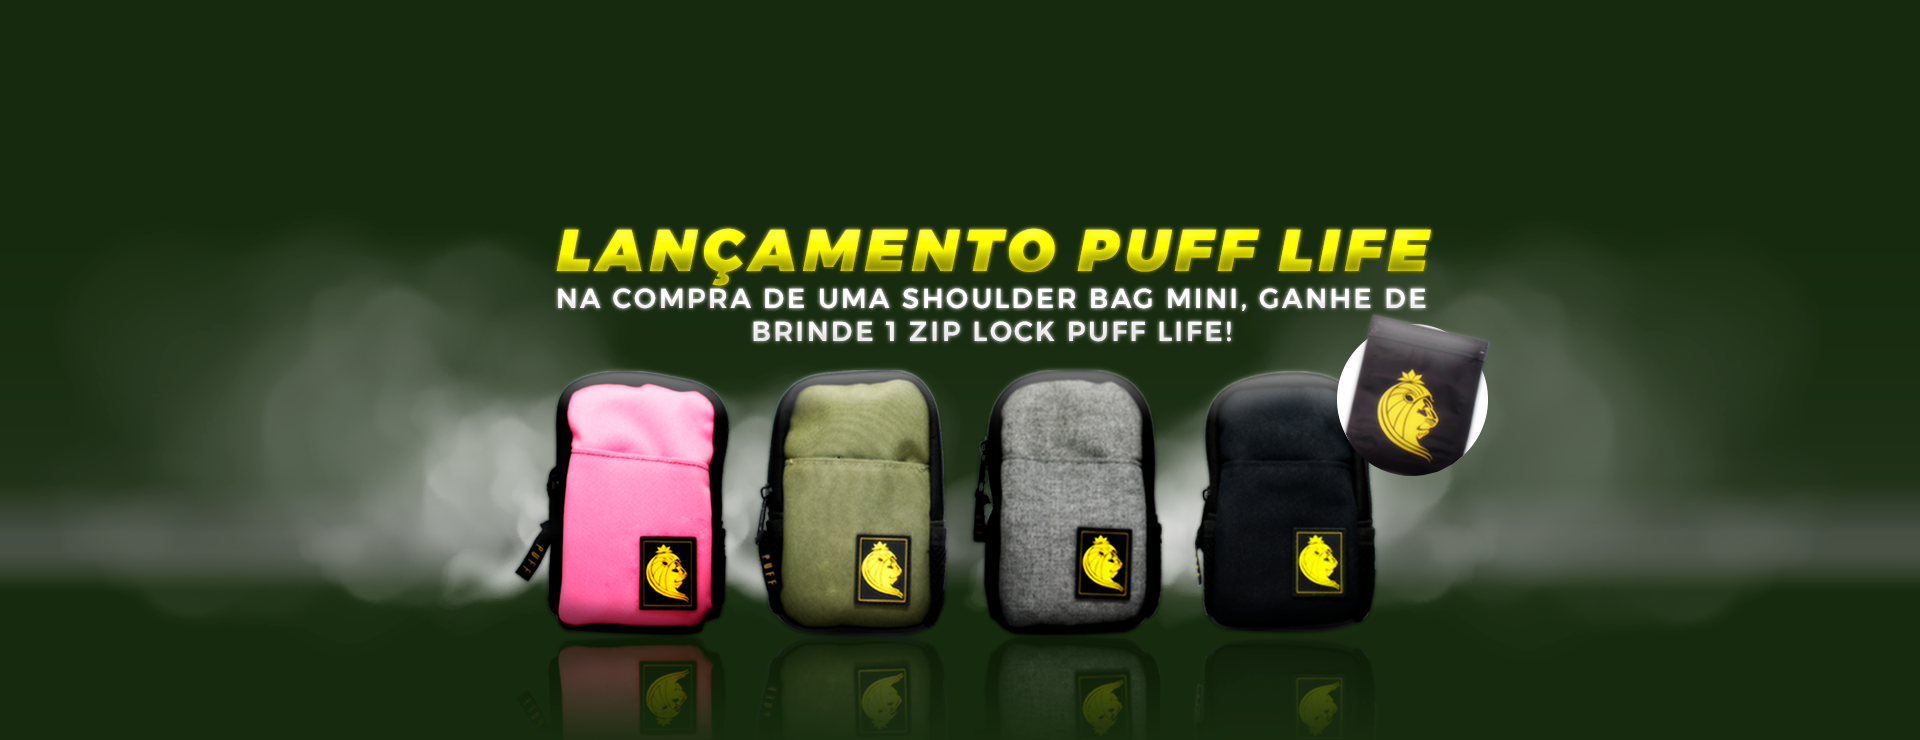 puff life